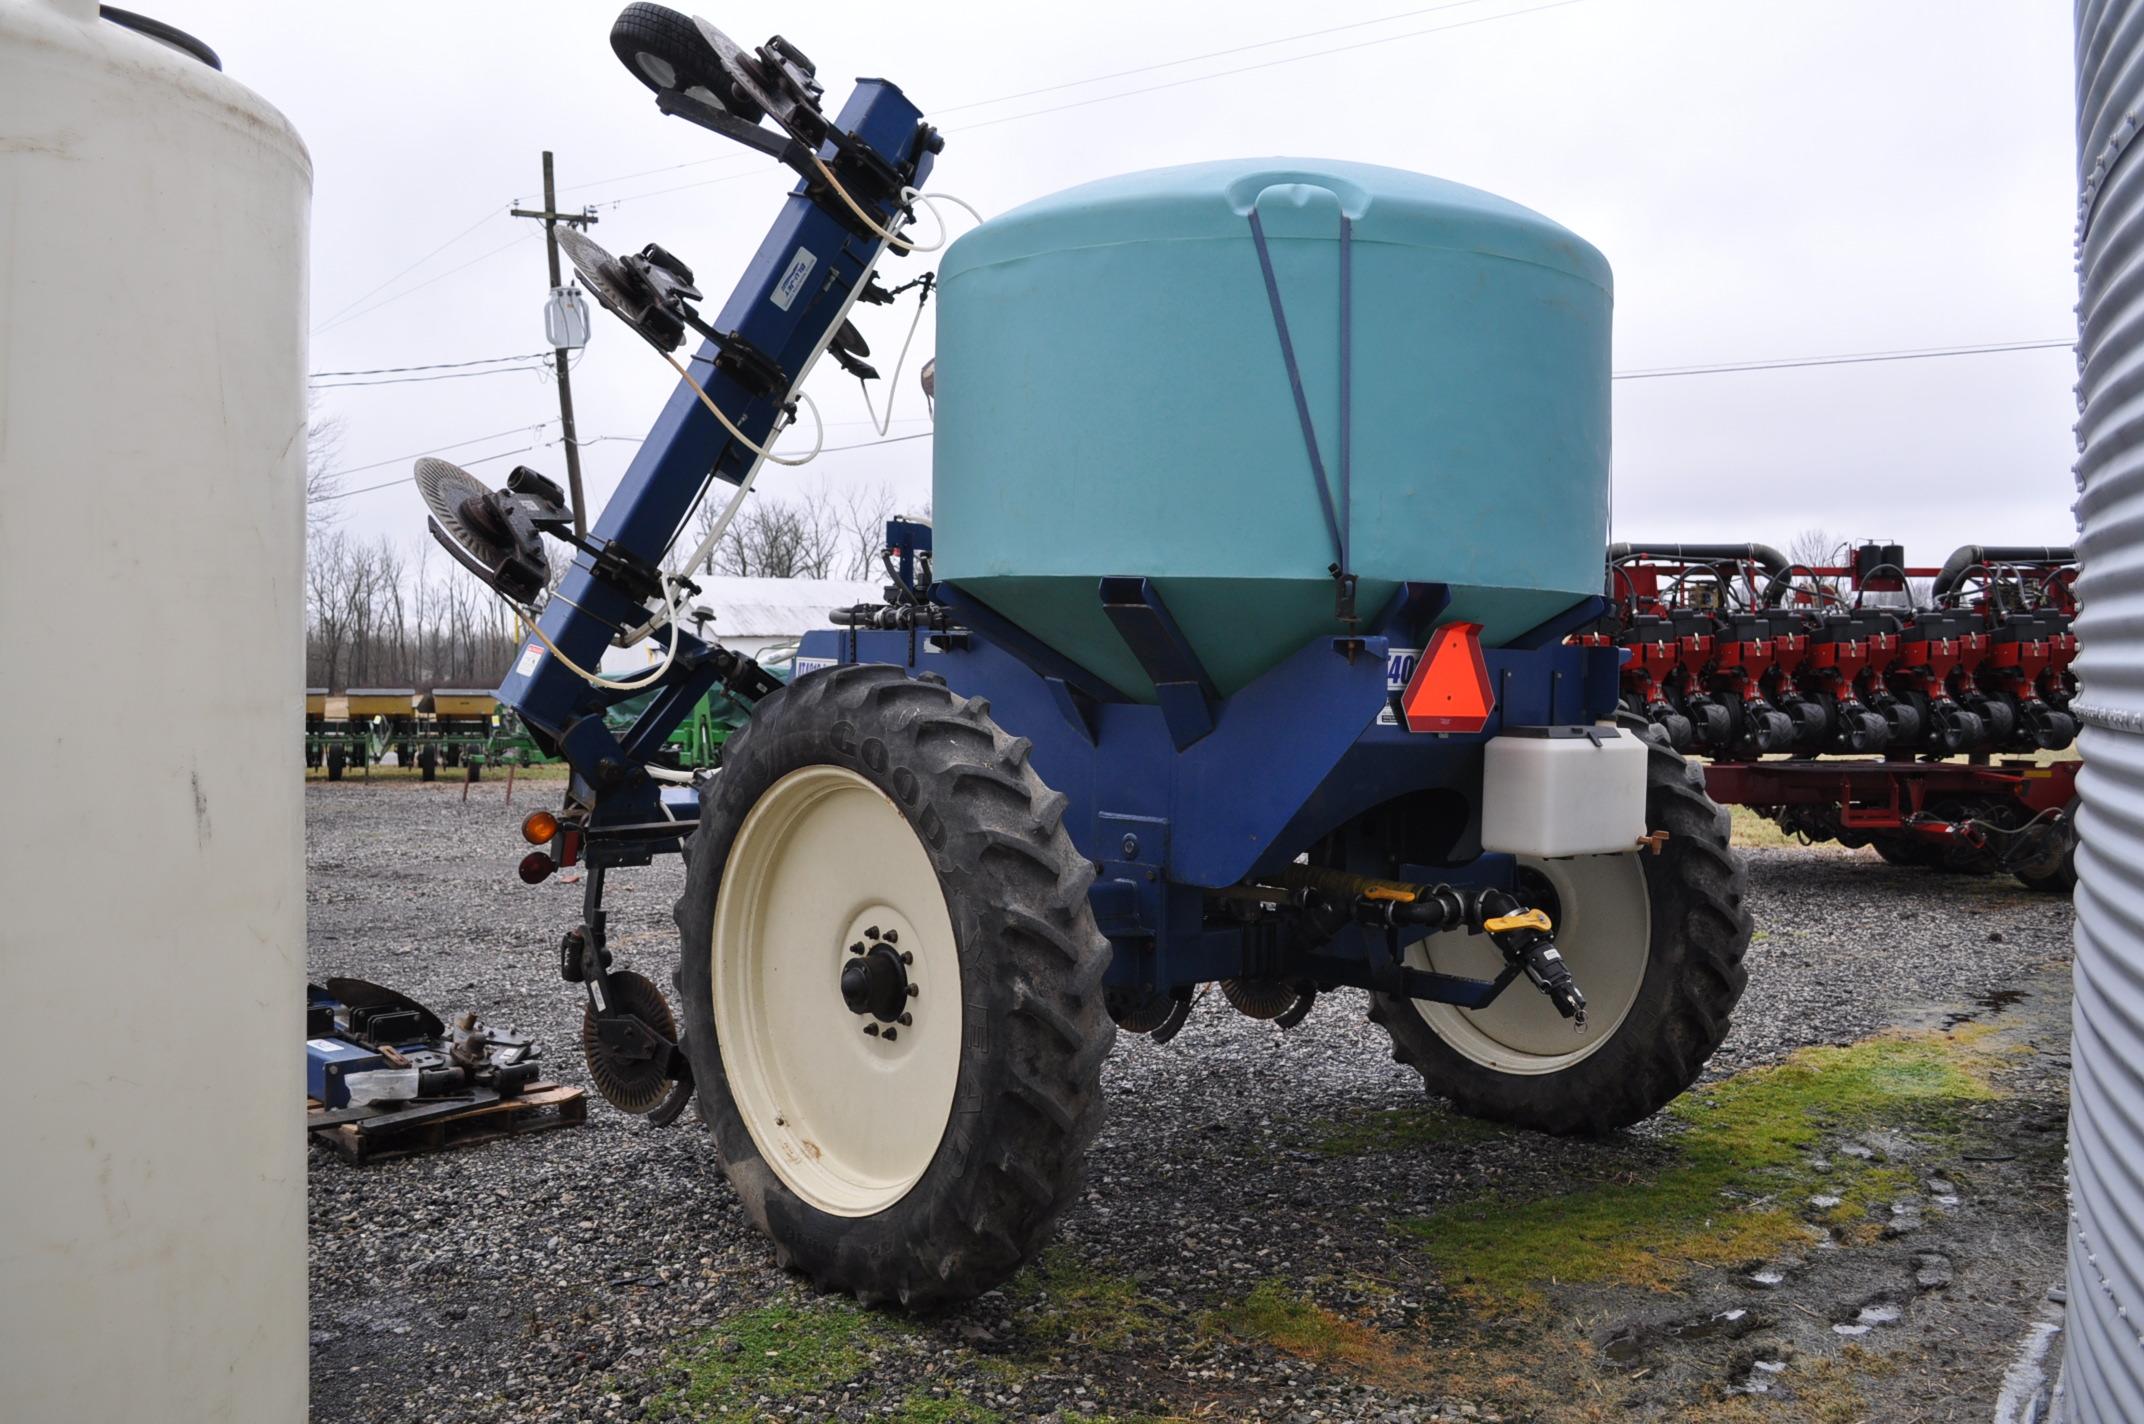 Blu-Jet AT 4010 28% applicator, 12/16 row, 1200 gal poly tank, 320/90R46 tires, hyd drive pump, - Image 4 of 12